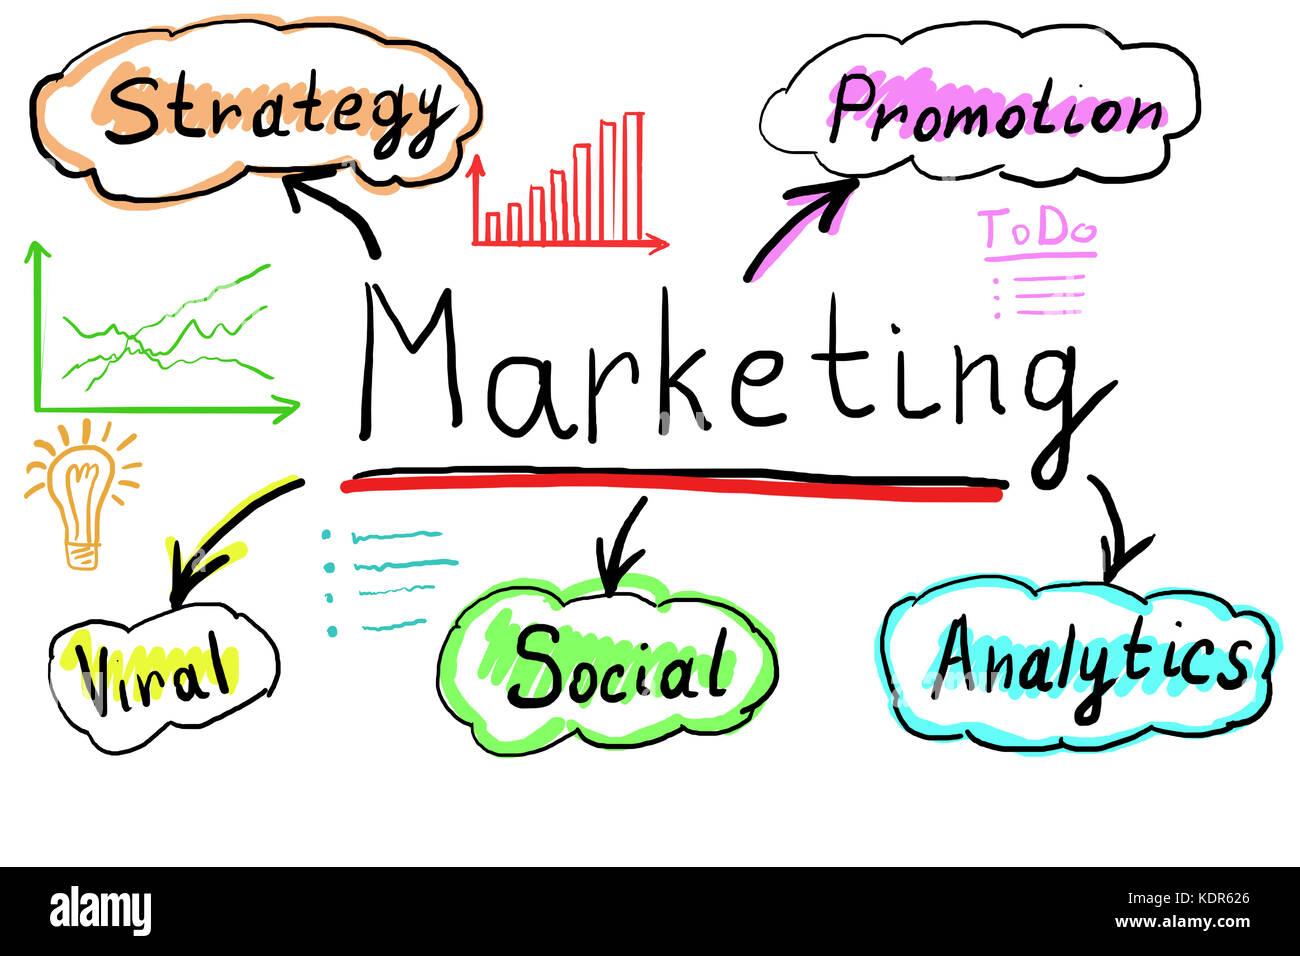 Illustrative Diagram Of Marketing Concept On White Background - Stock Image